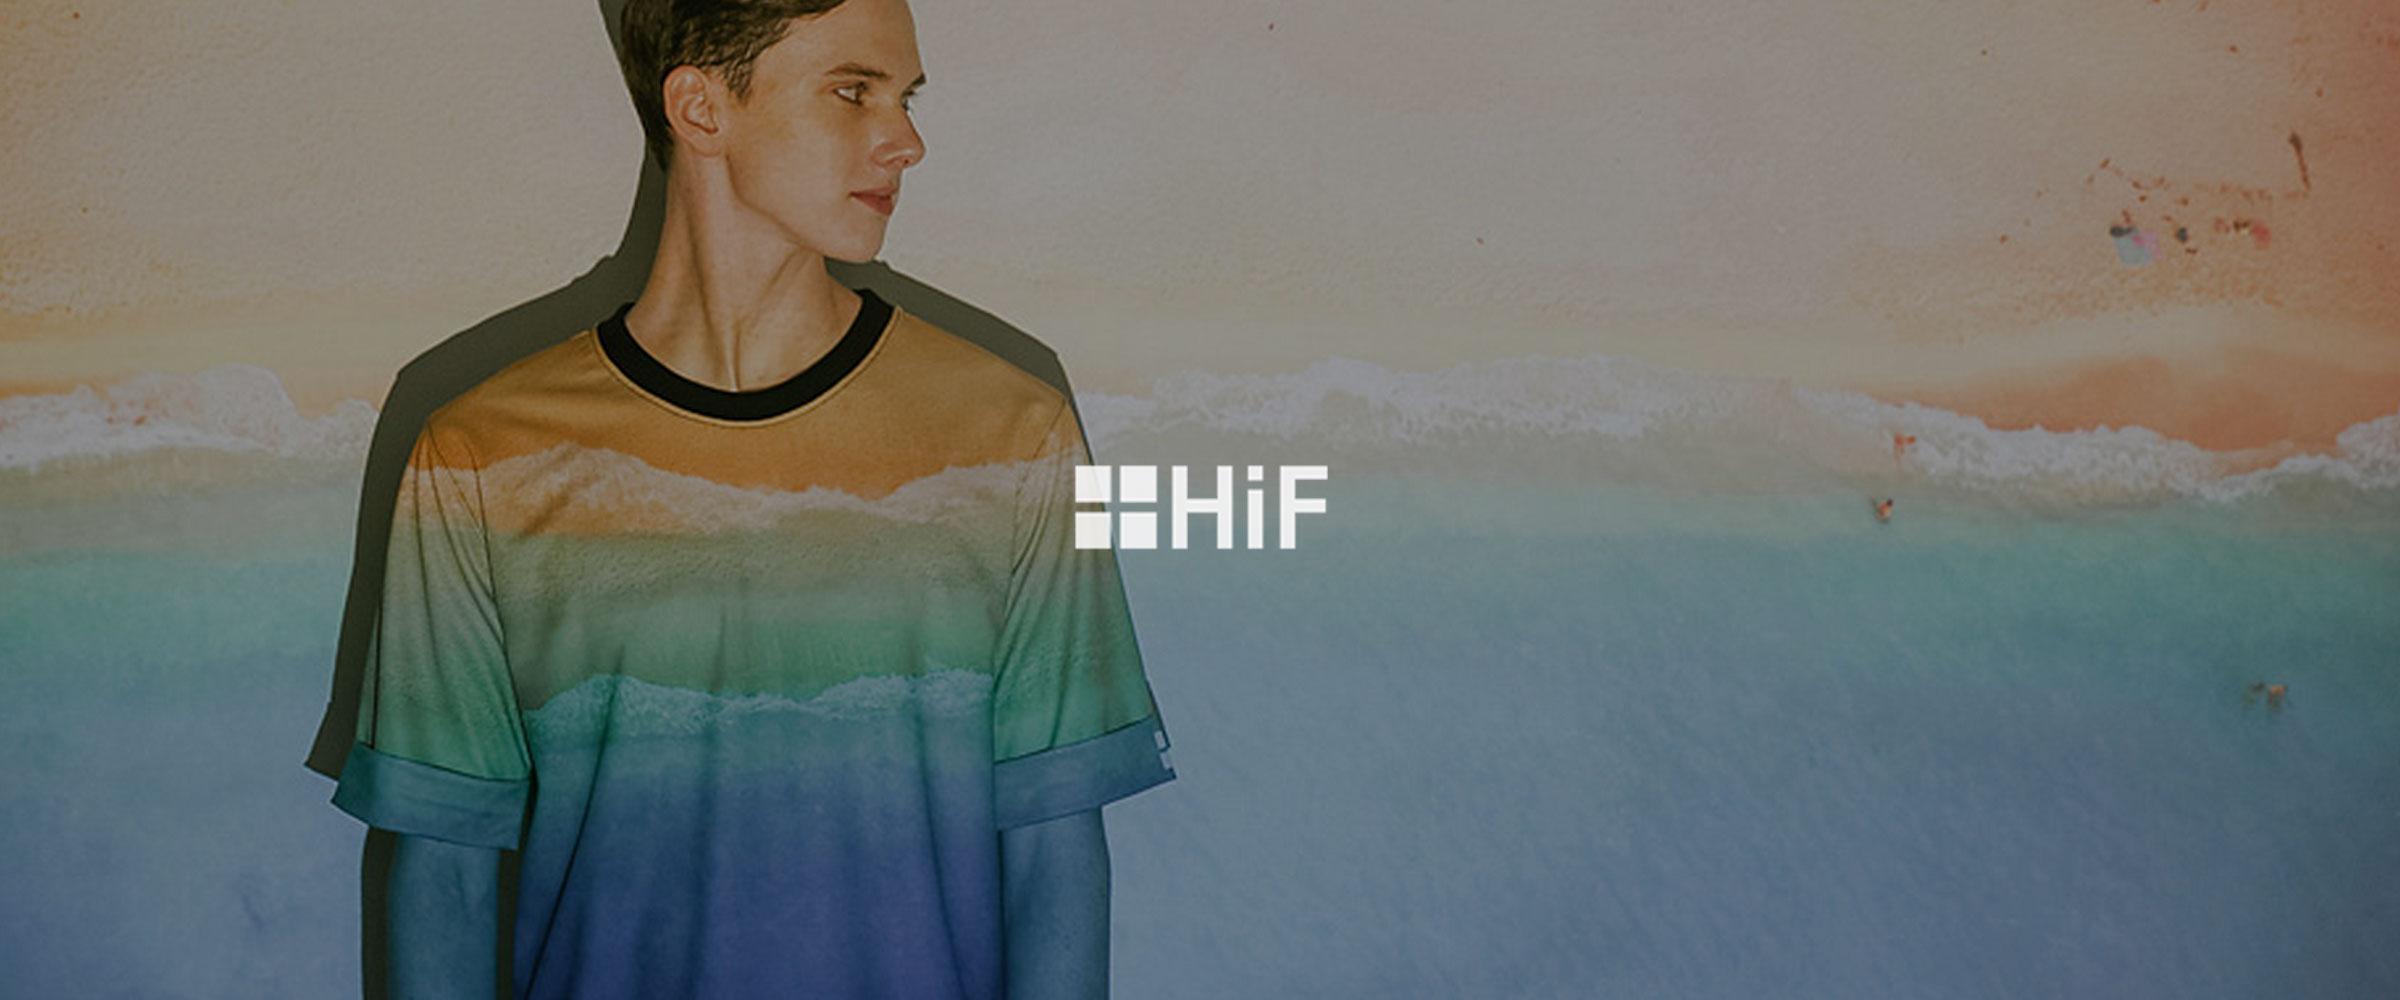 hif.jpg